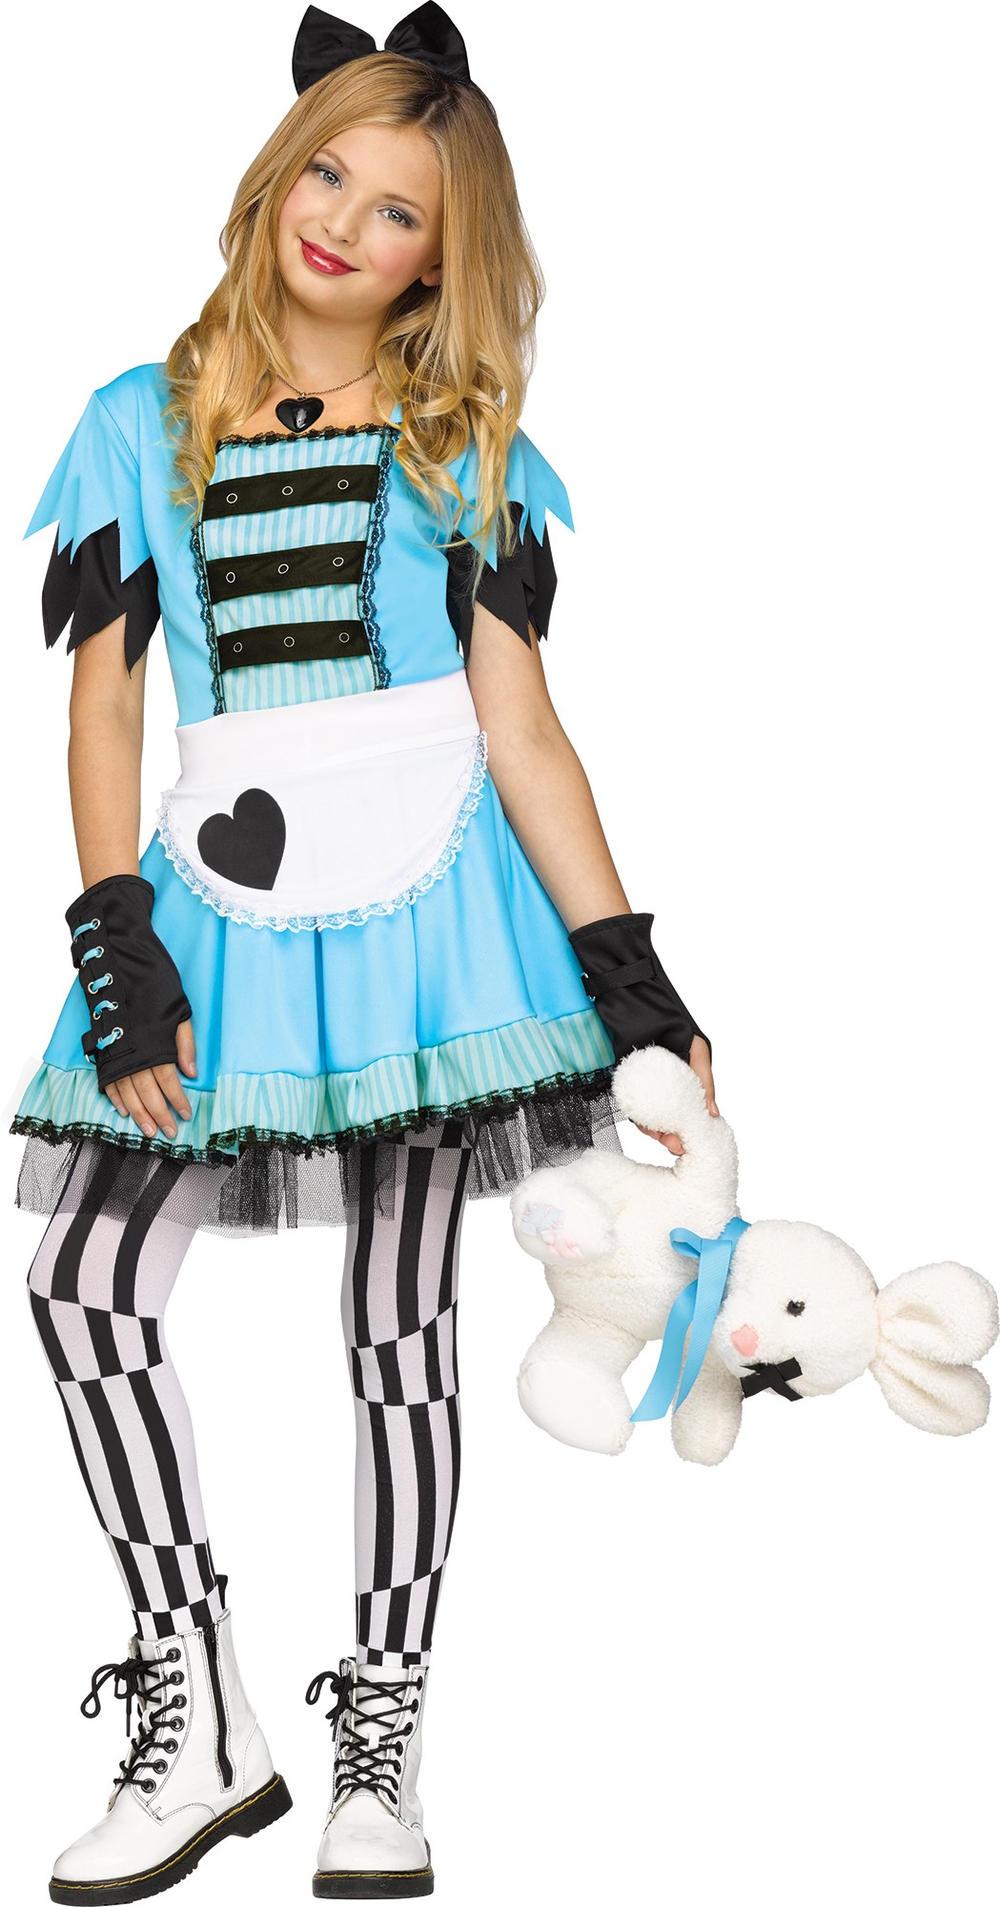 Wild Alice In Wonderland Girls Halloween Fancy Dress Kids Childs Costume Outfit